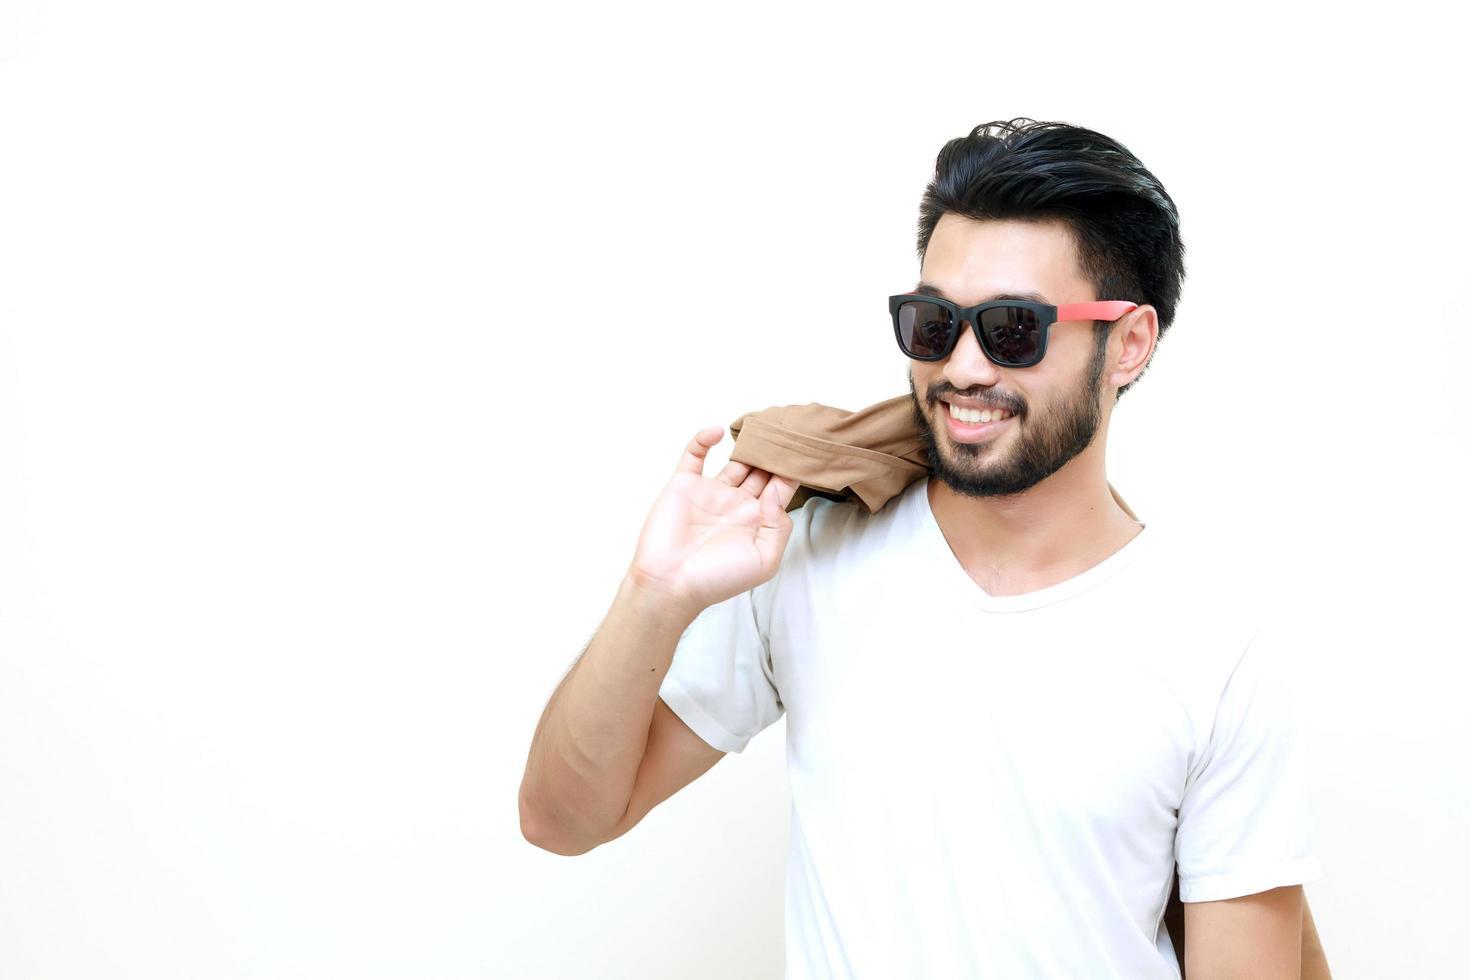 uomo asiatico con i baffi sorridente su sfondo bianco foto